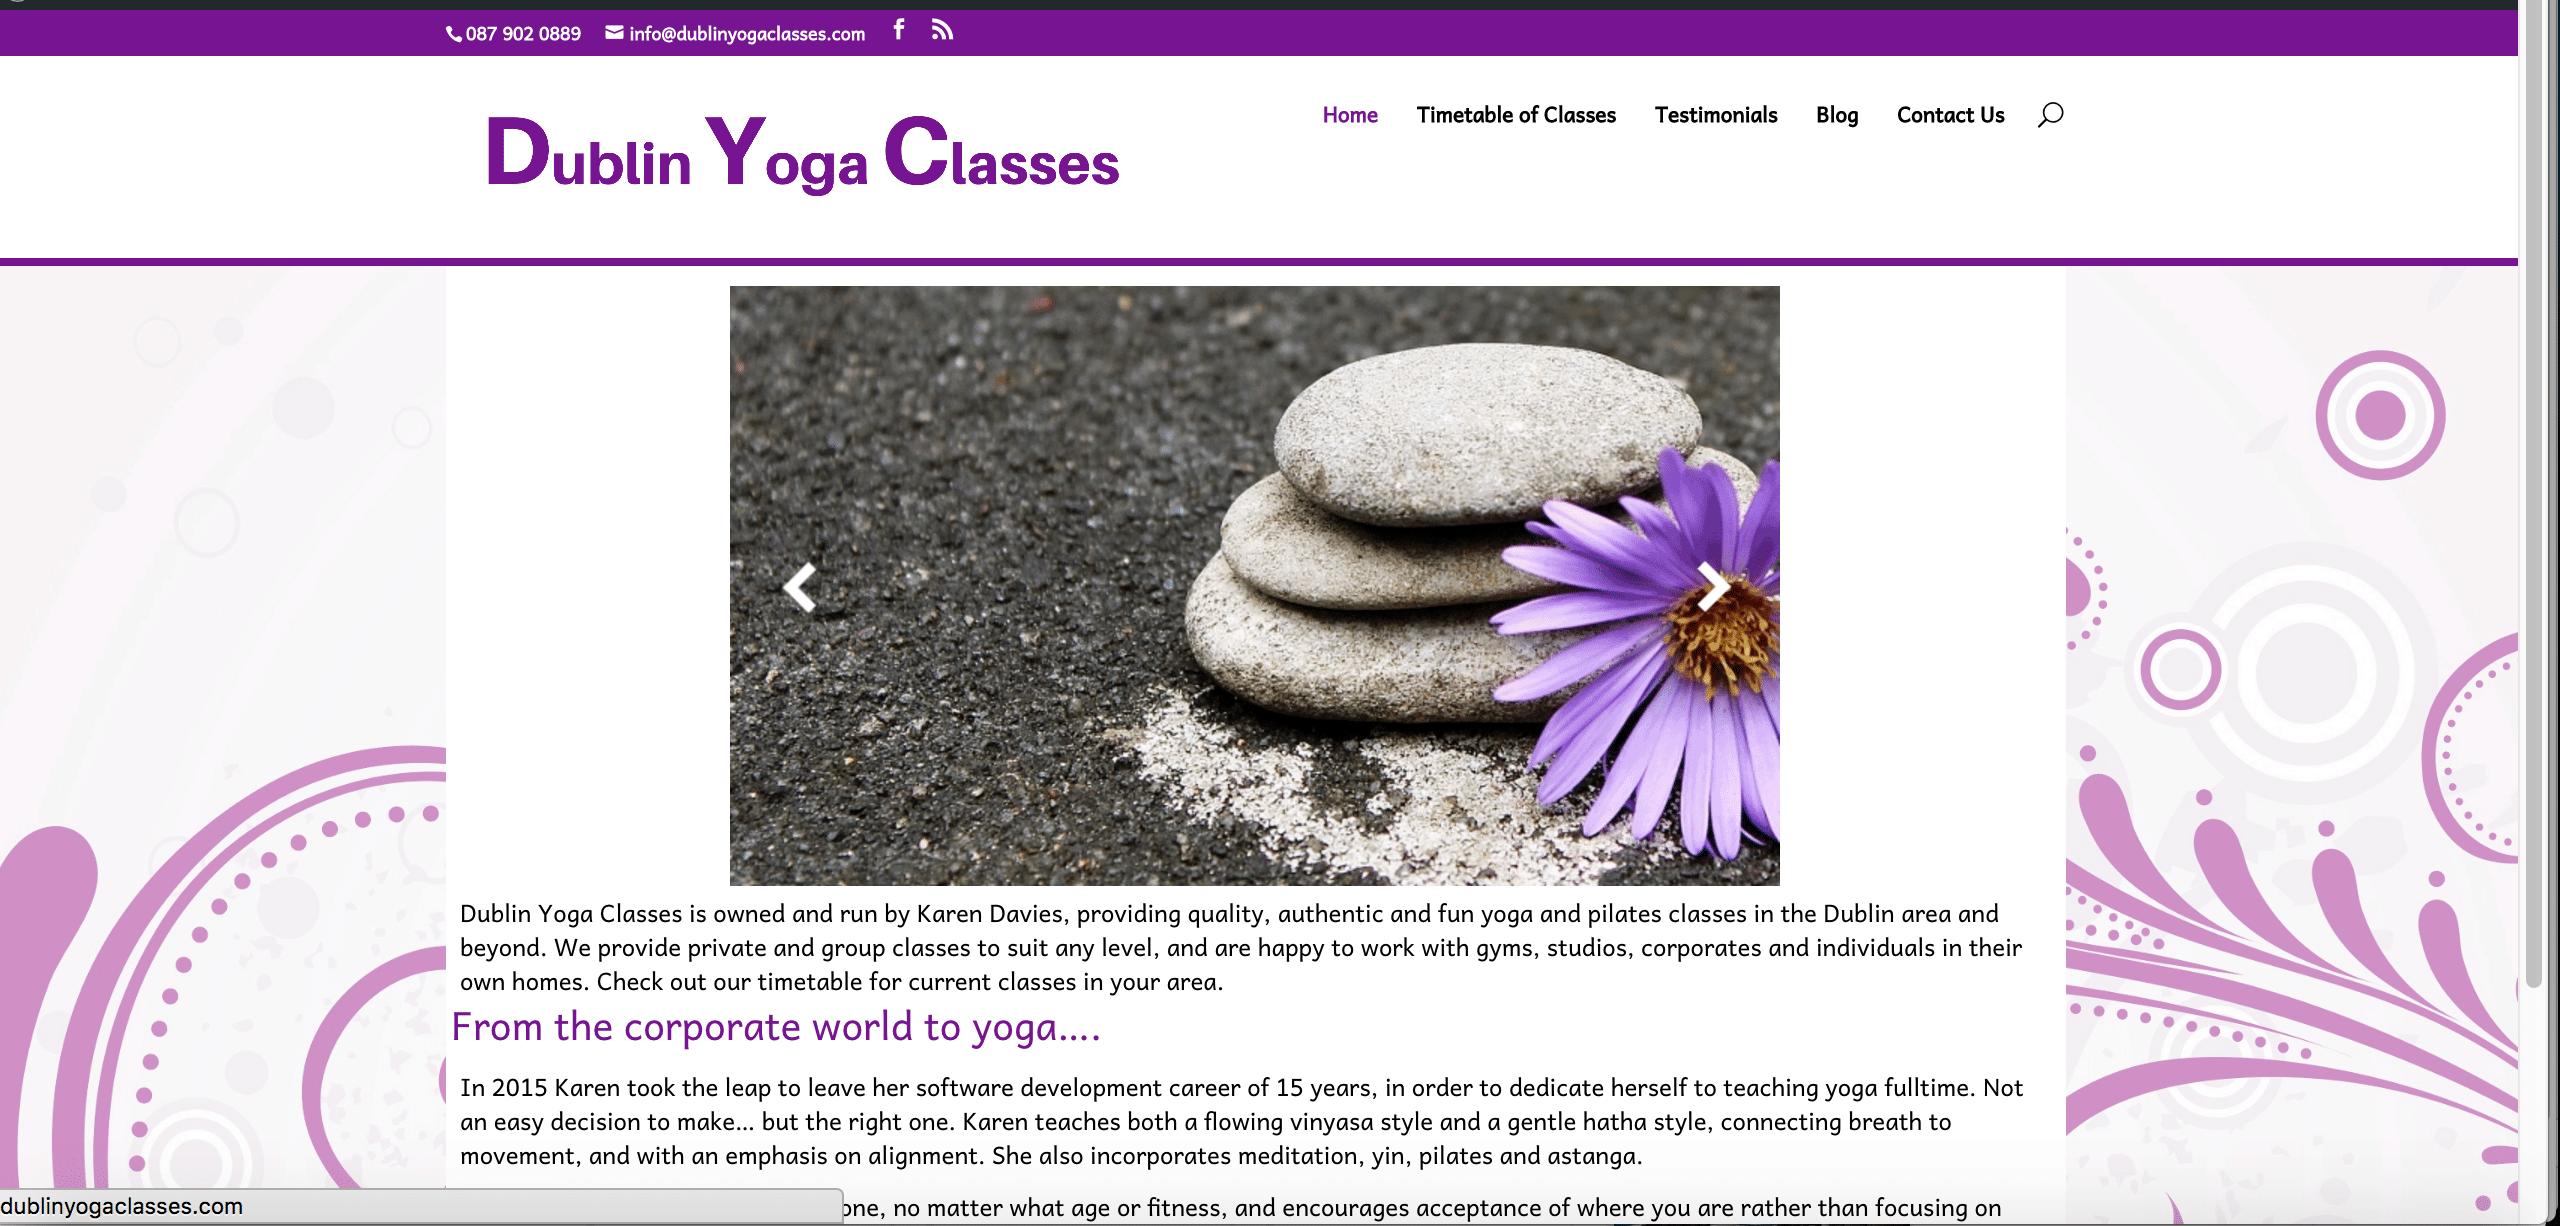 Dublin Yoga Classes Web Design